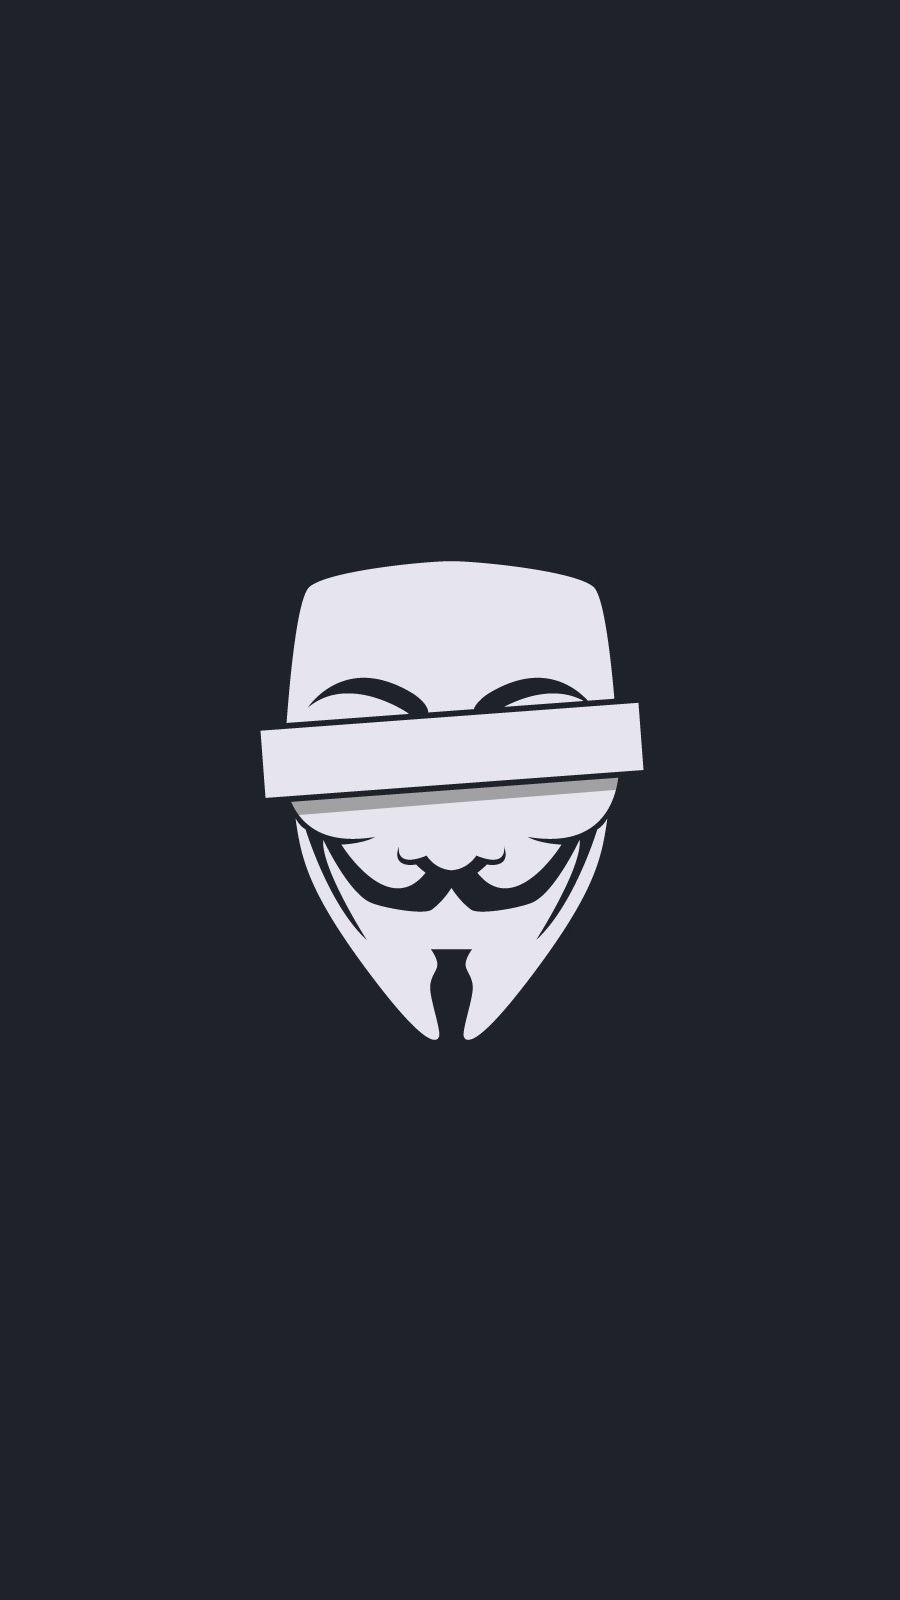 Vendetta Wallpapers Top Free Vendetta Backgrounds Wallpaperaccess